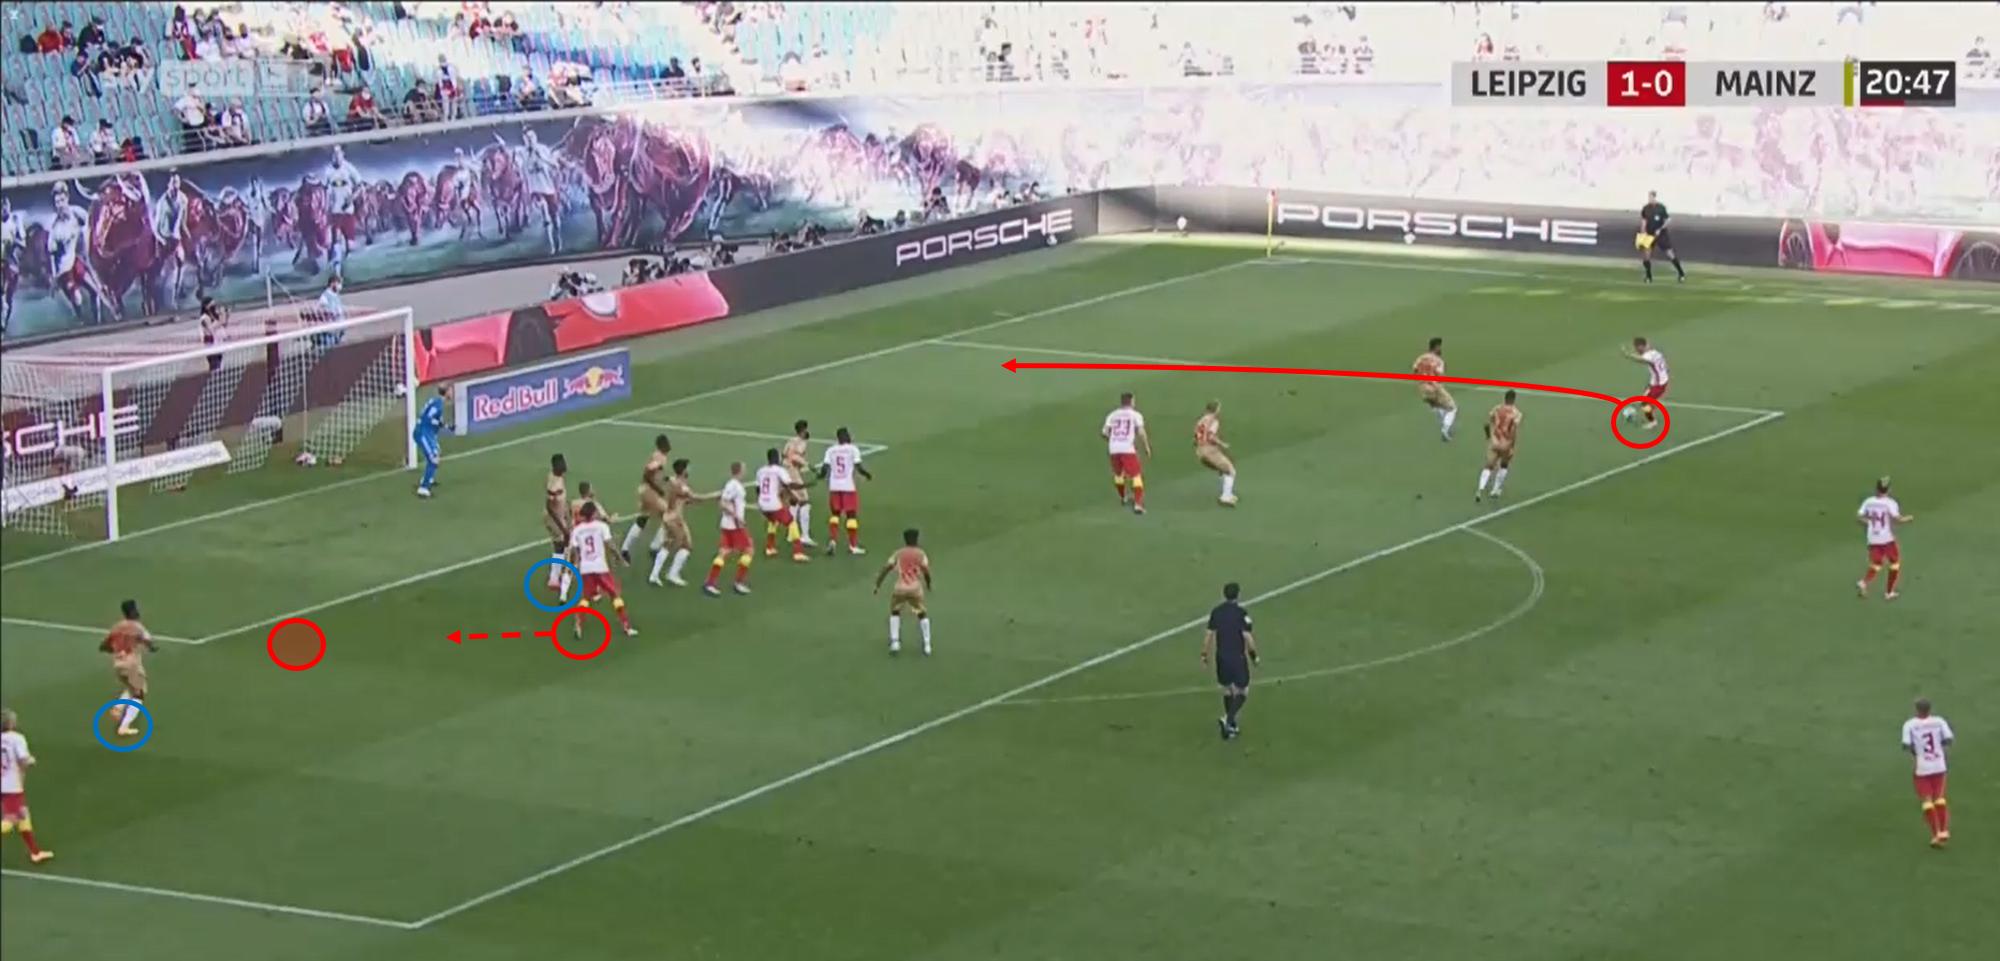 Bundesliga 2020/21: RB Leipzig vs Mainz 05 – tactical analysis - tactics